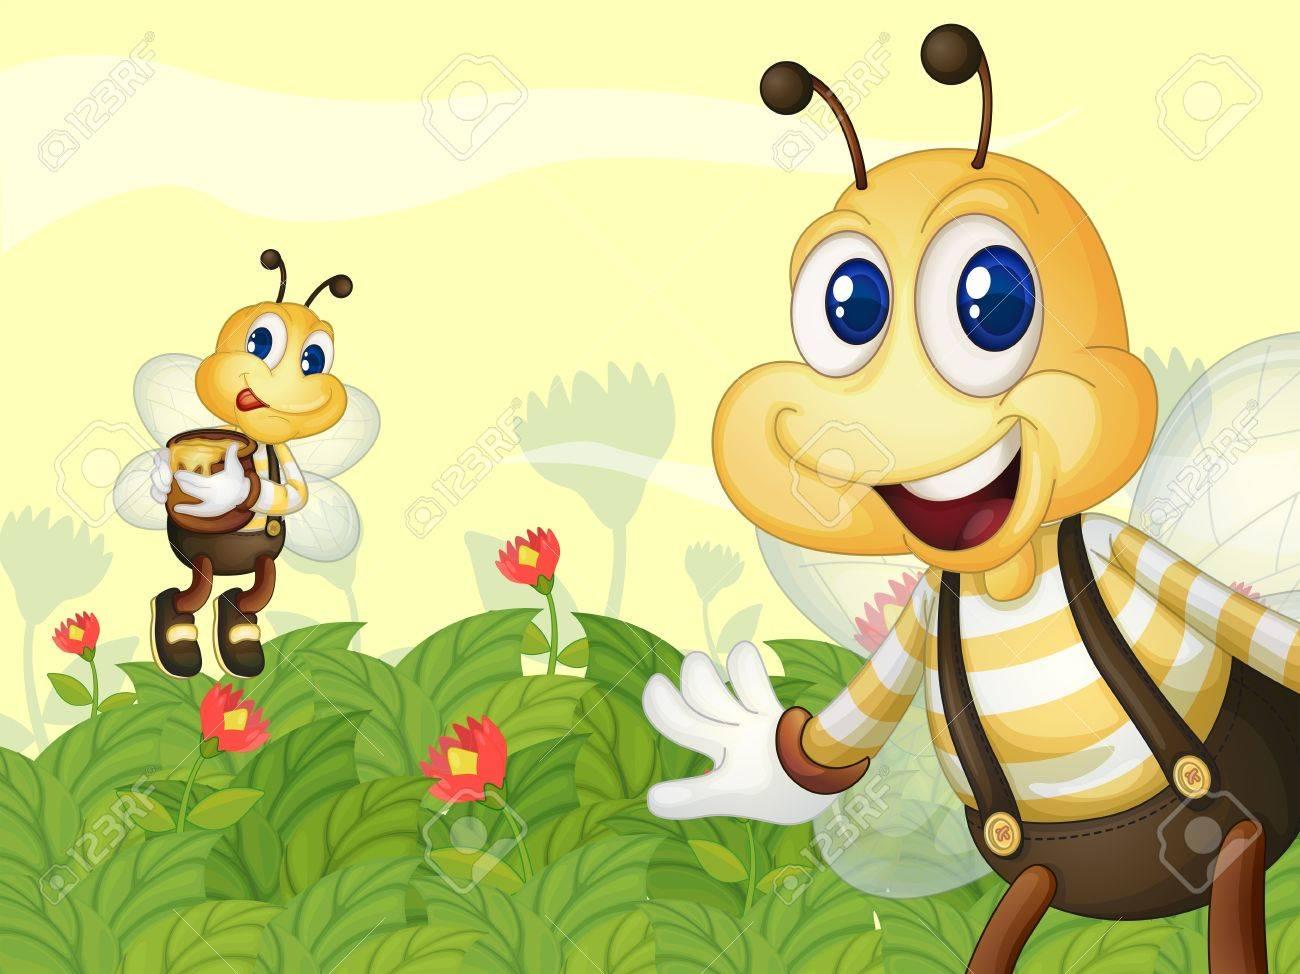 Illustration of honeybees in the garden Stock Vector - 17896315